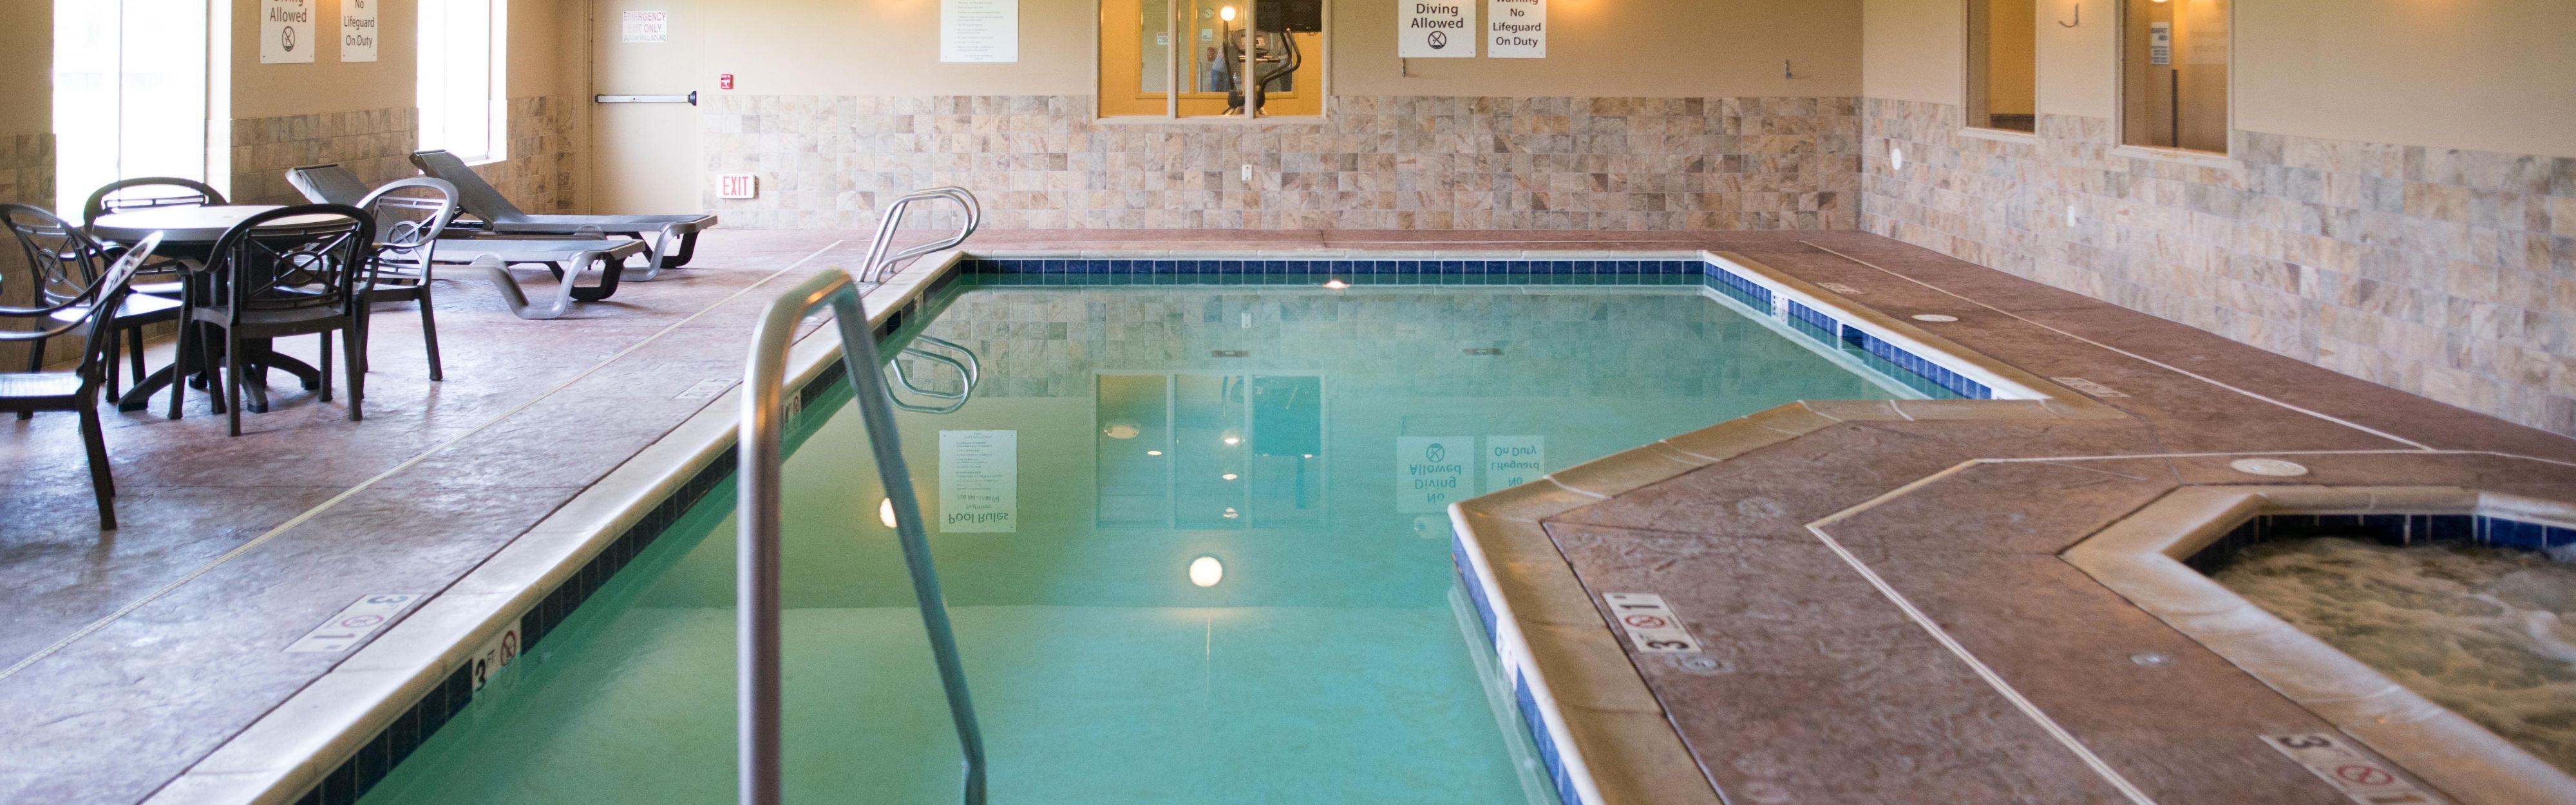 Holiday Inn Express & Suites Northwood image 2